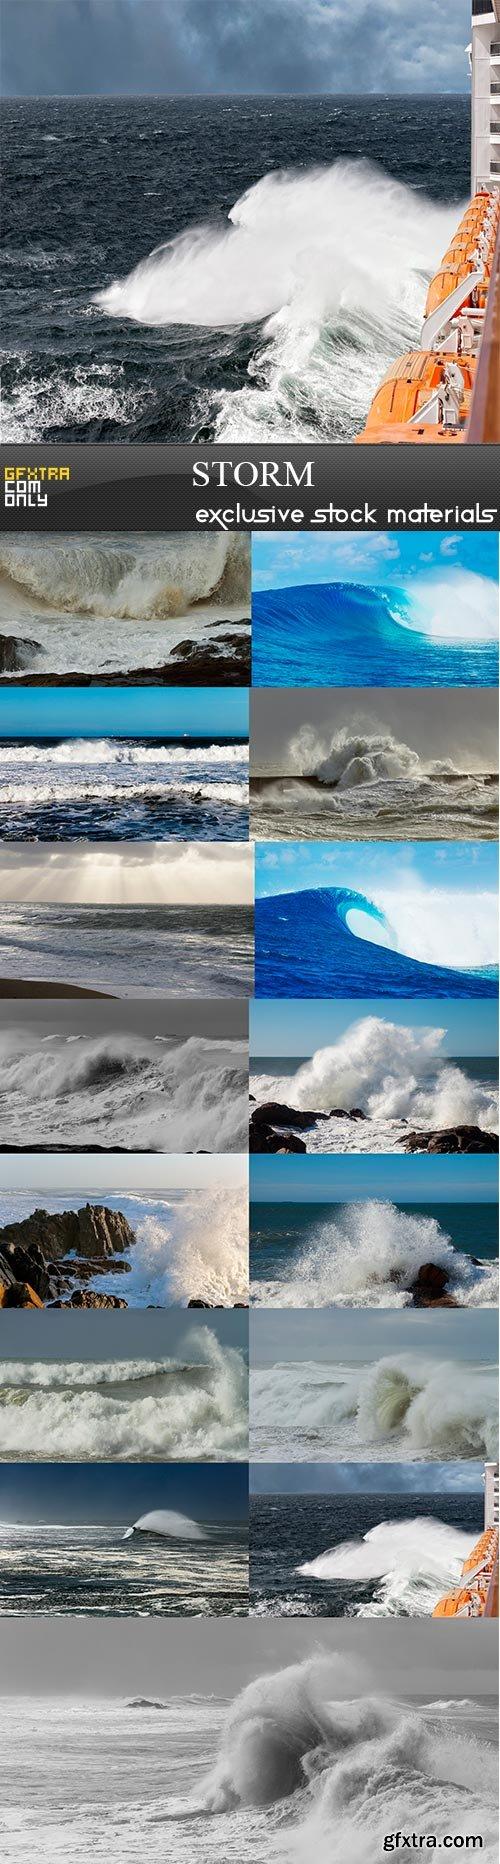 Storm,15x UHQ JPEG